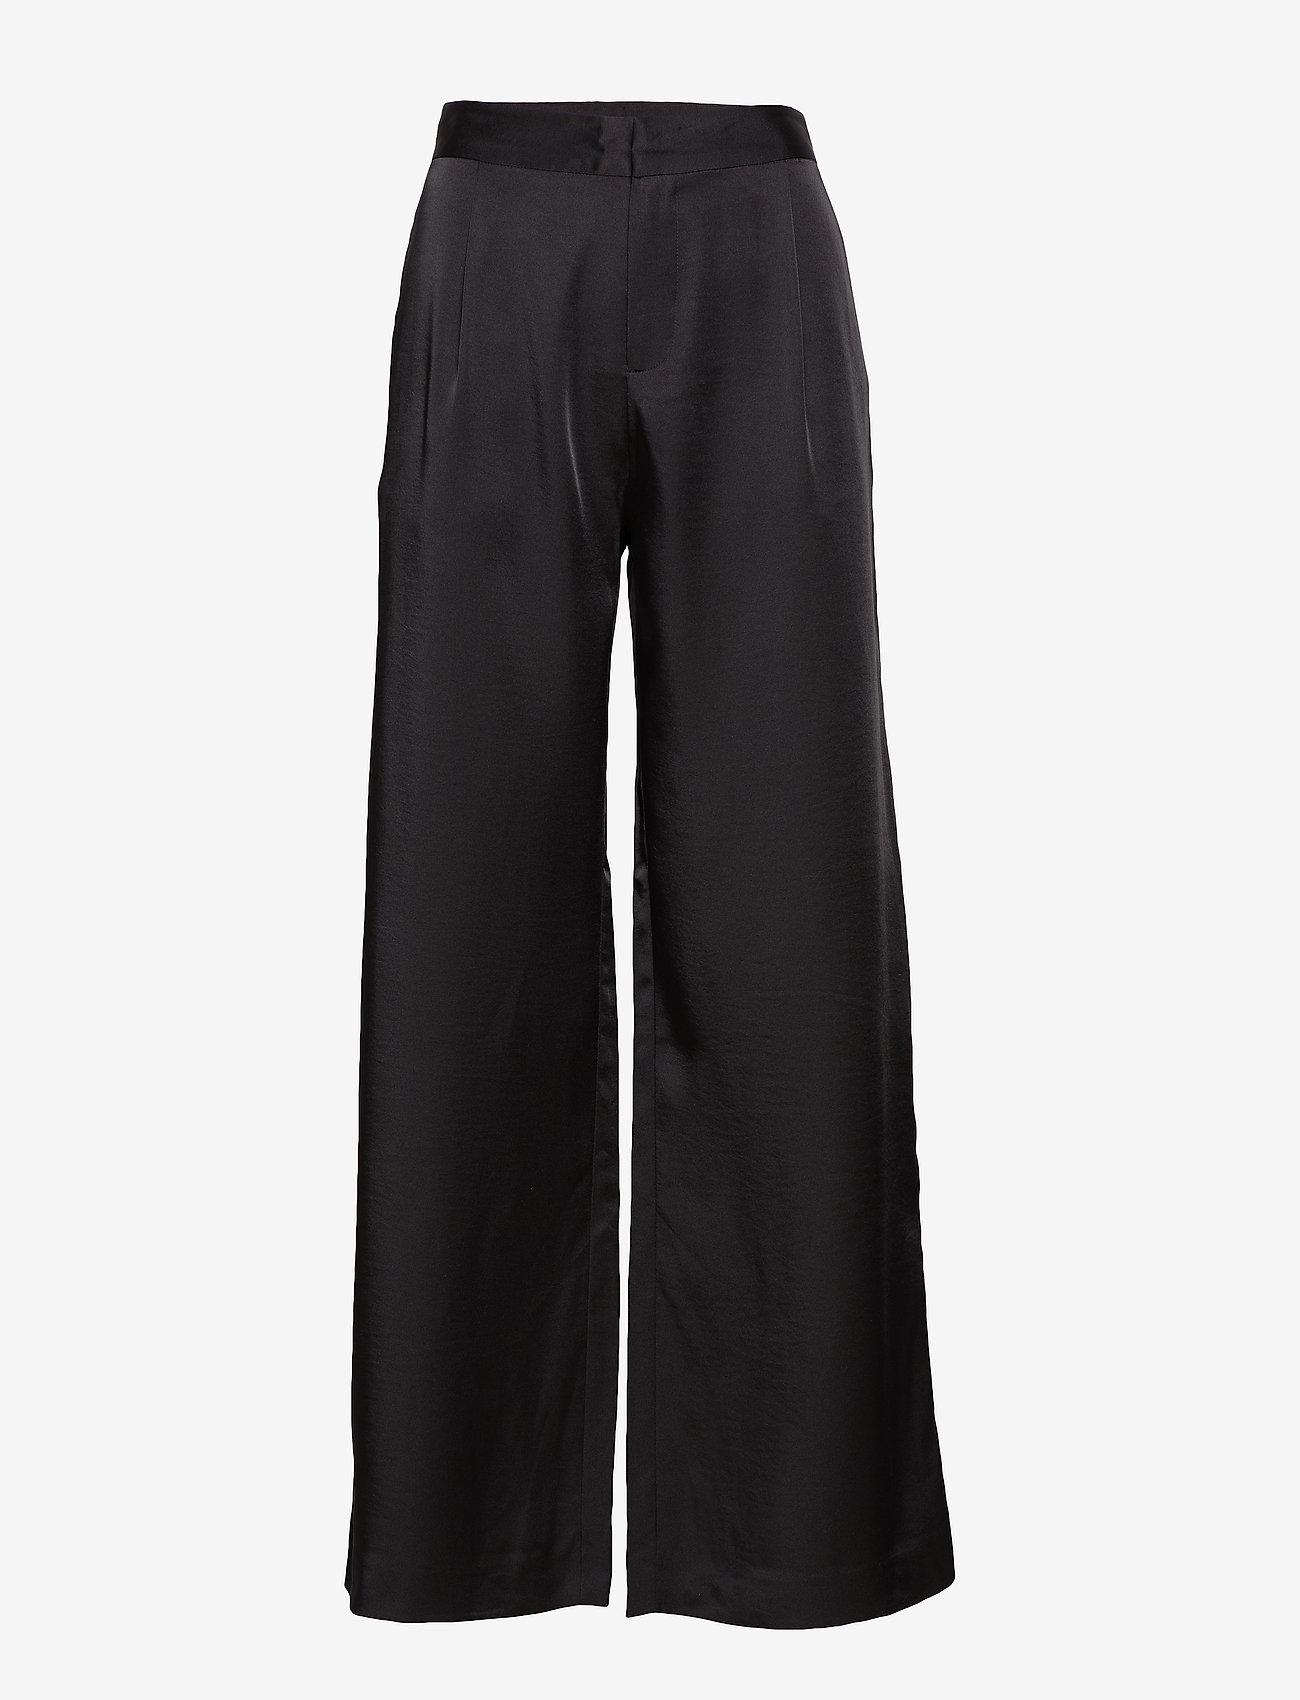 2NDDAY - 2ND Duffy - wide leg trousers - black - 0